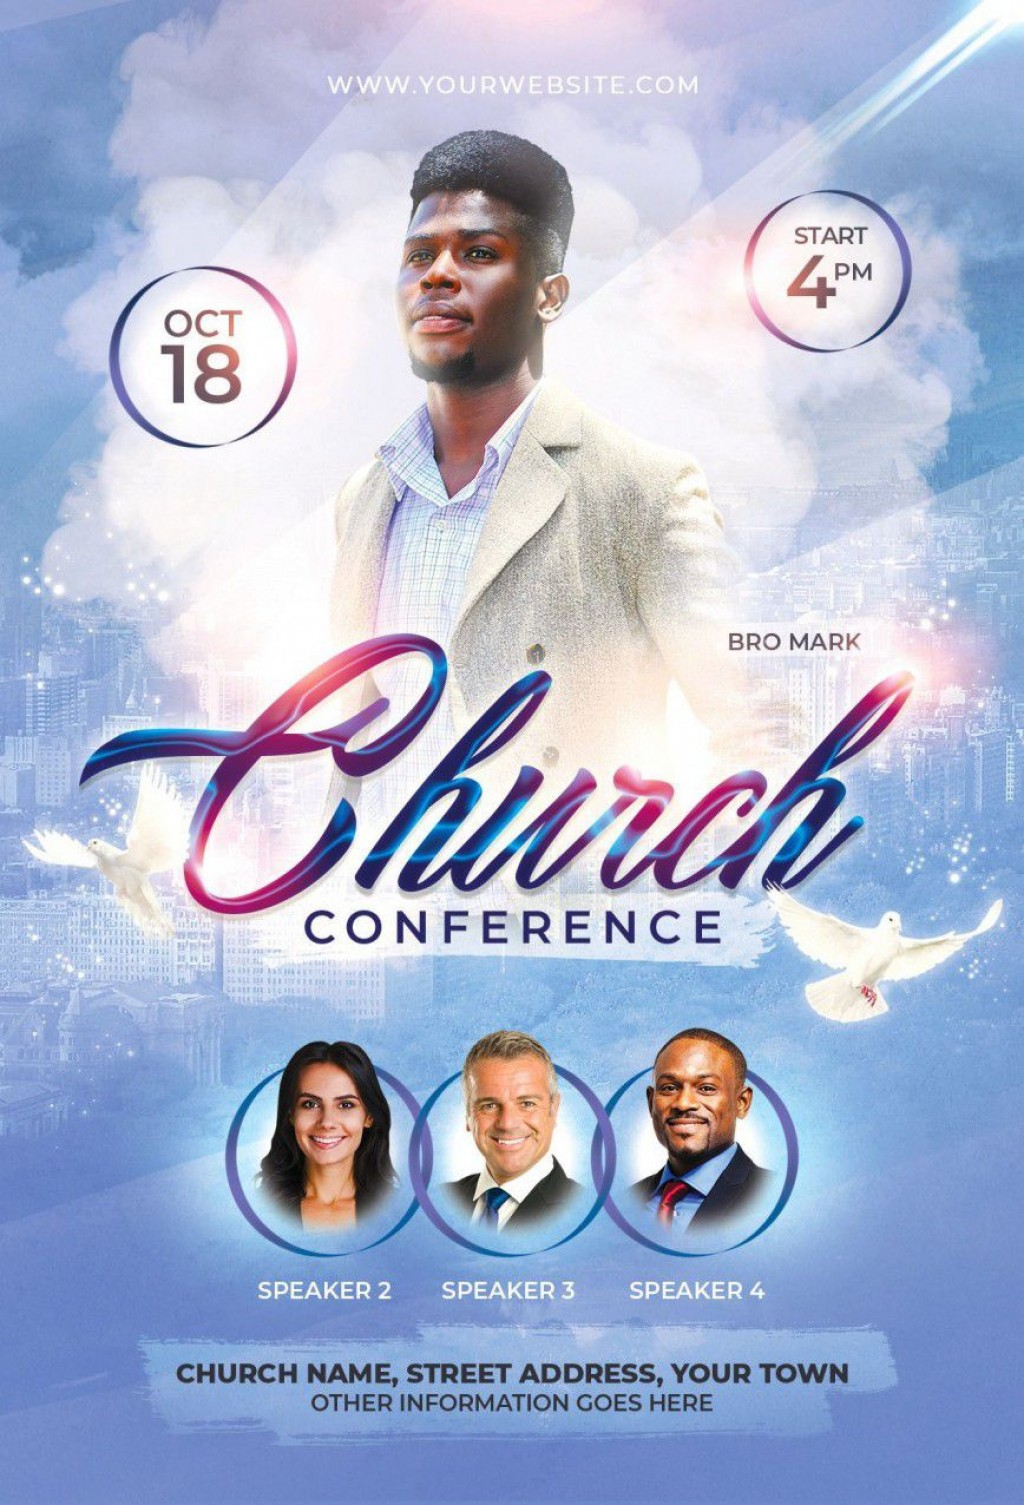 000 Wonderful Church Flyer Template Photoshop Free High Resolution  PsdLarge